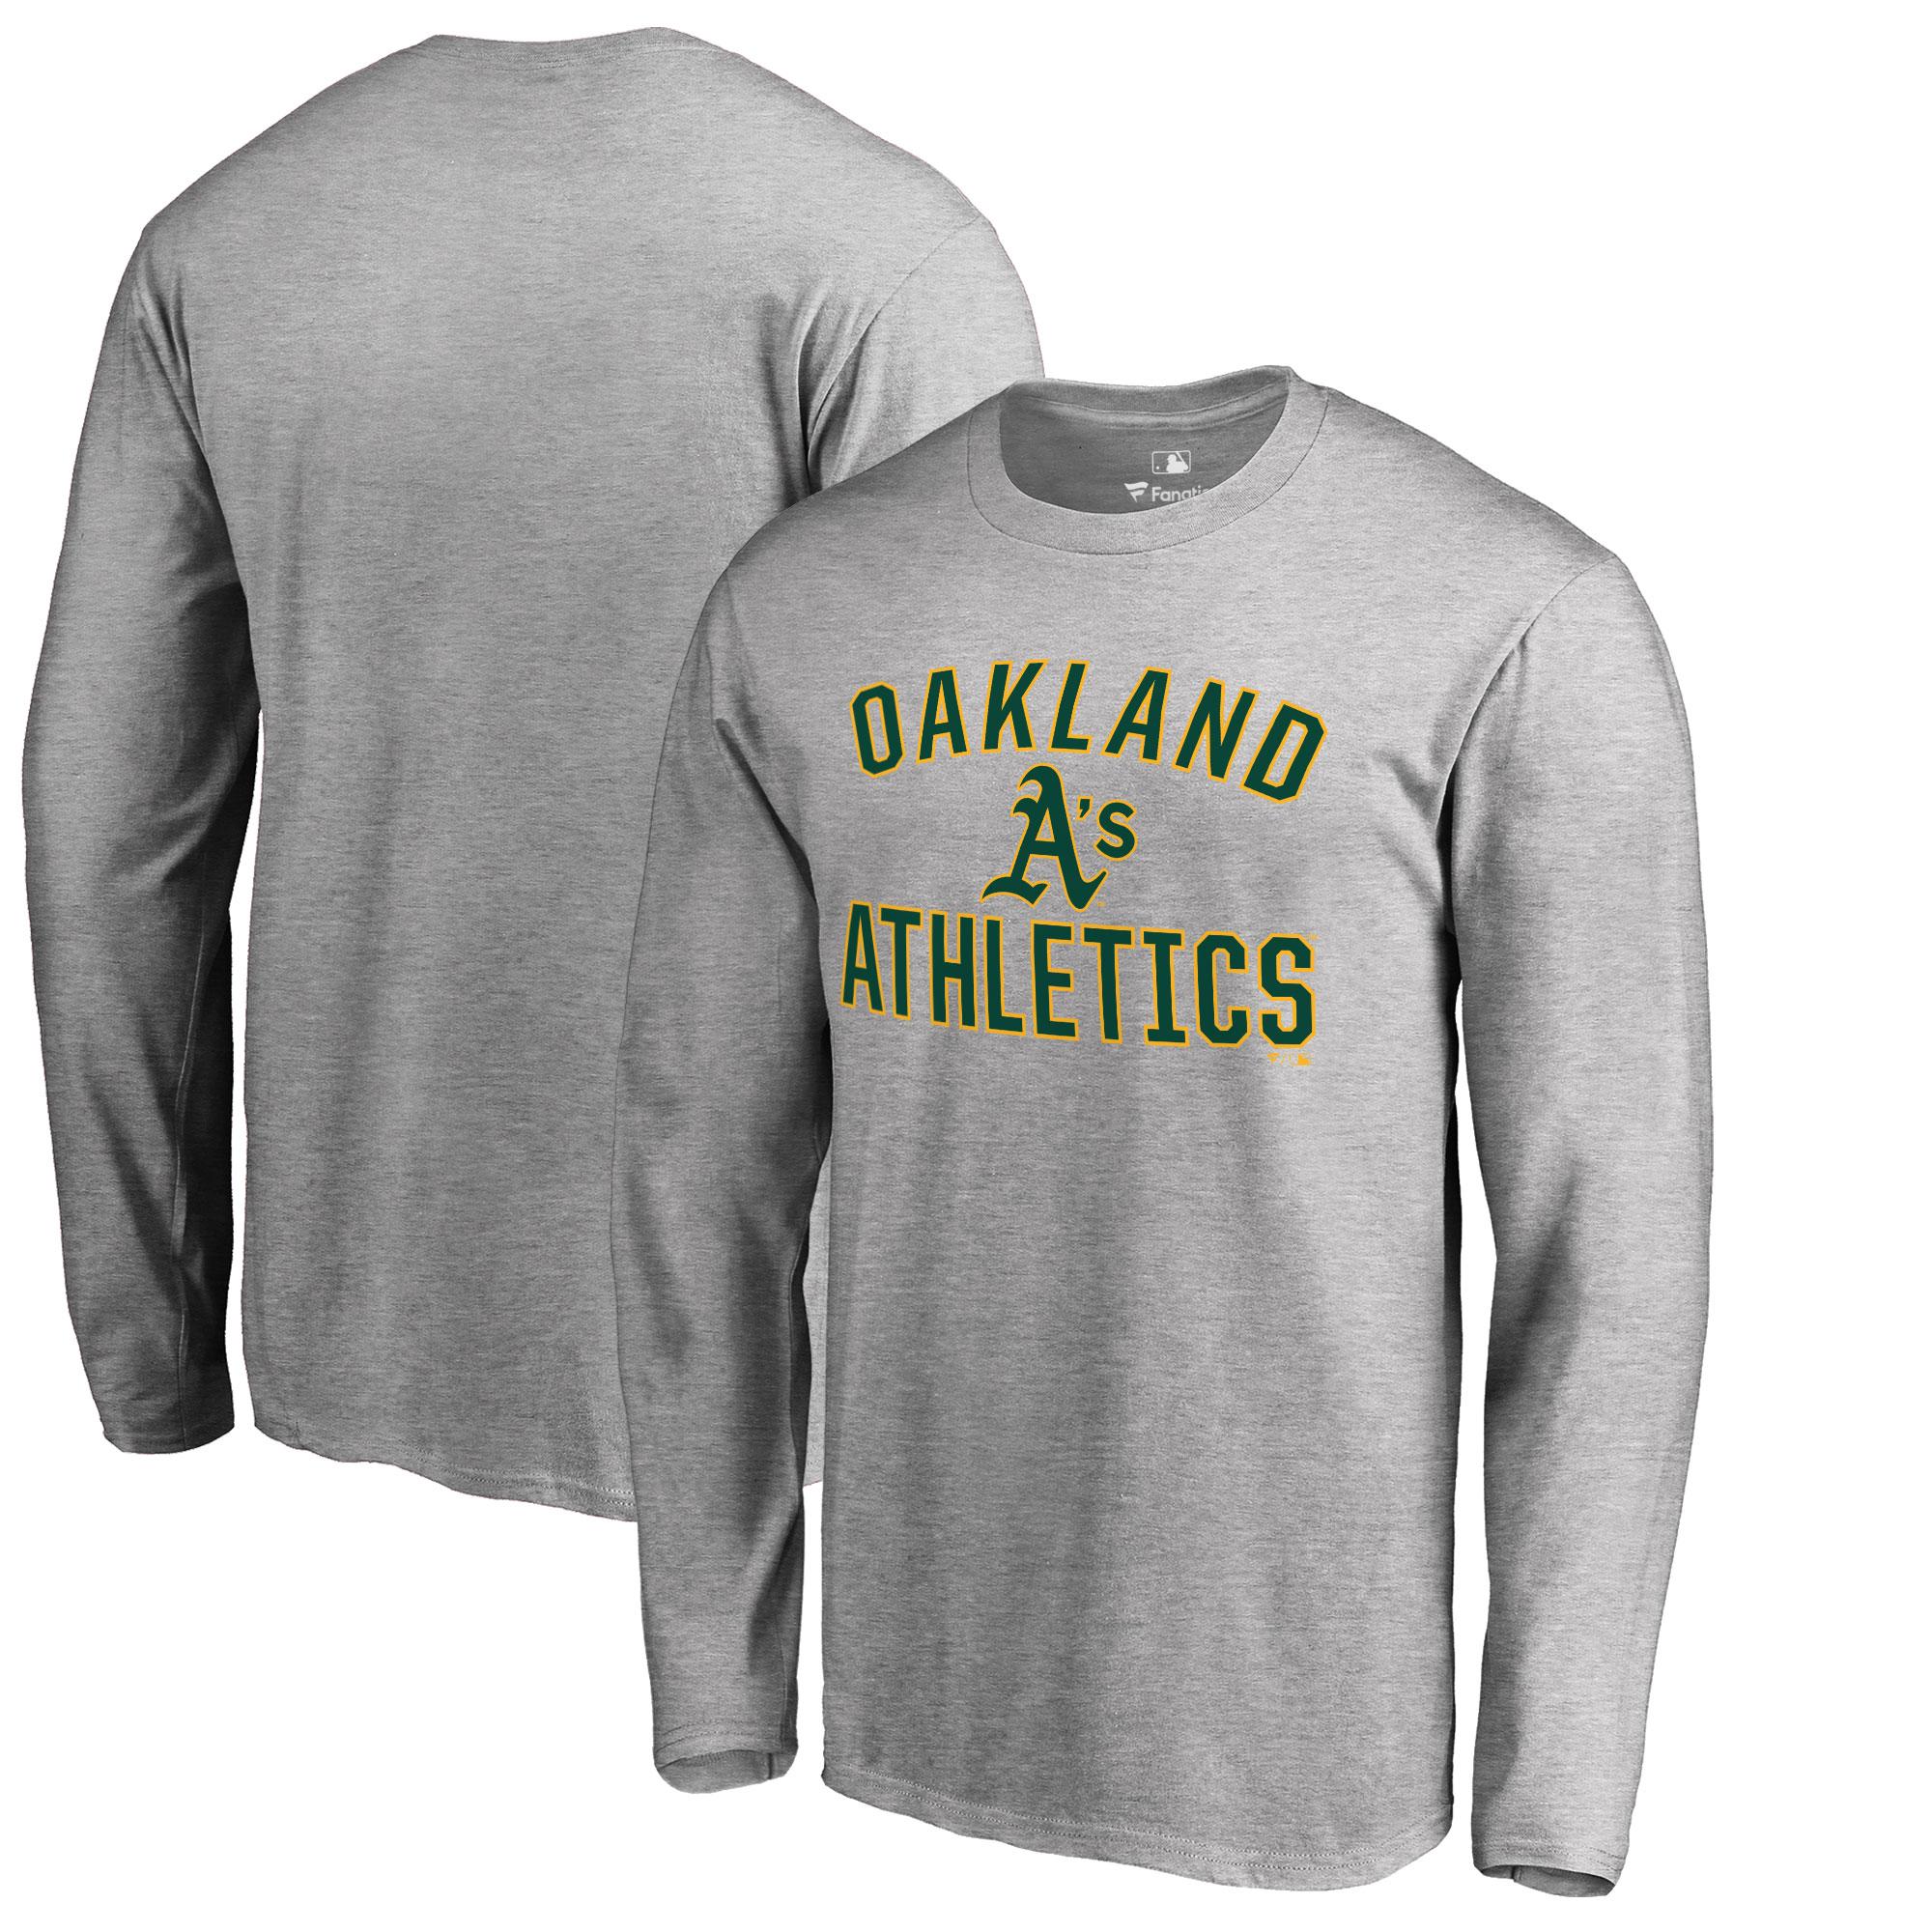 Oakland Athletics Big & Tall Victory Arch Long Sleeve T-Shirt - Ash